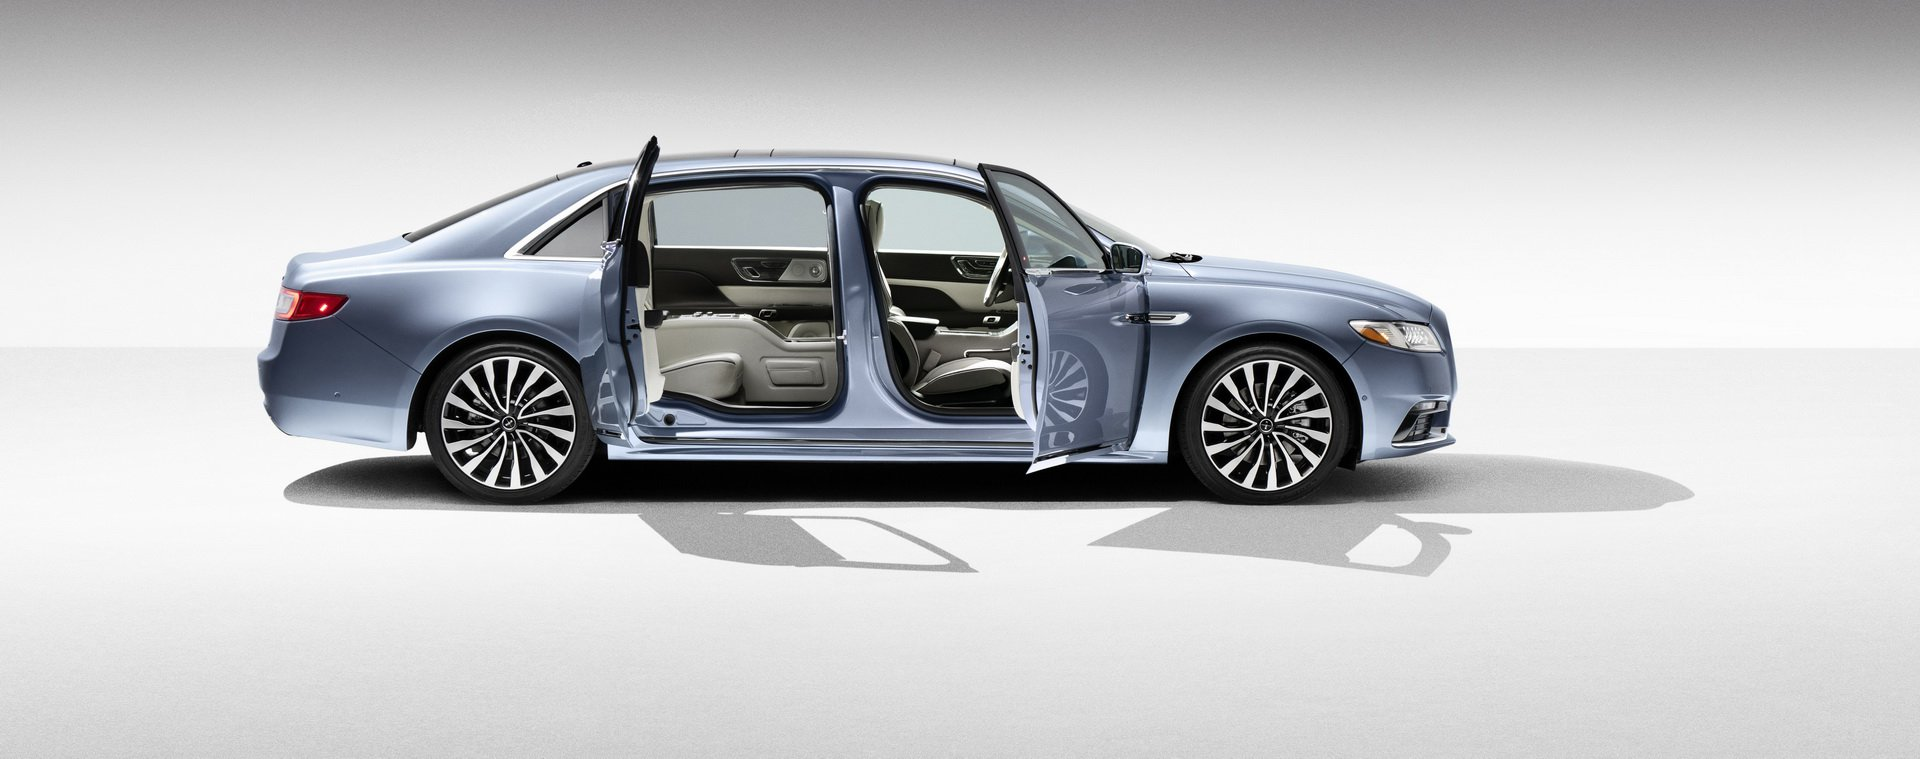 Lincoln Continental Coach Door Edition (46)